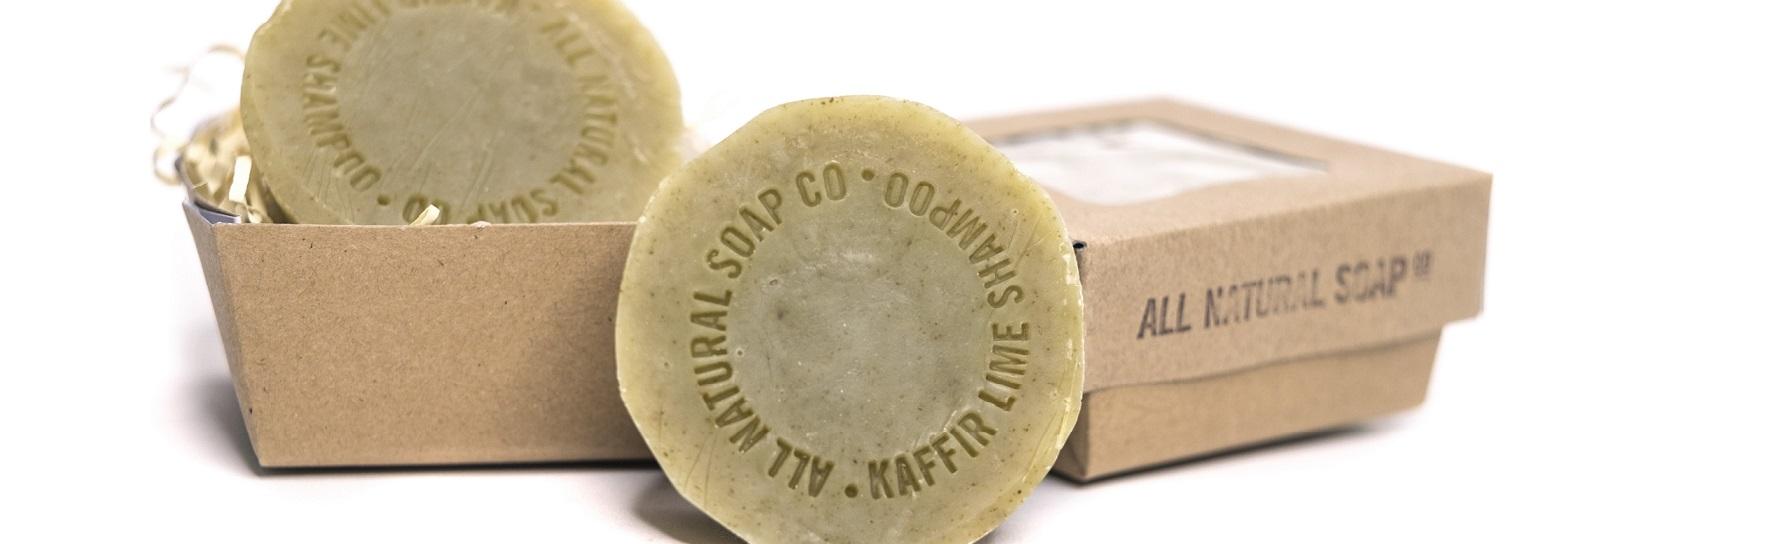 Kaffir-Lime-Shampoo_ALL-NATURAL-SOAP-Co